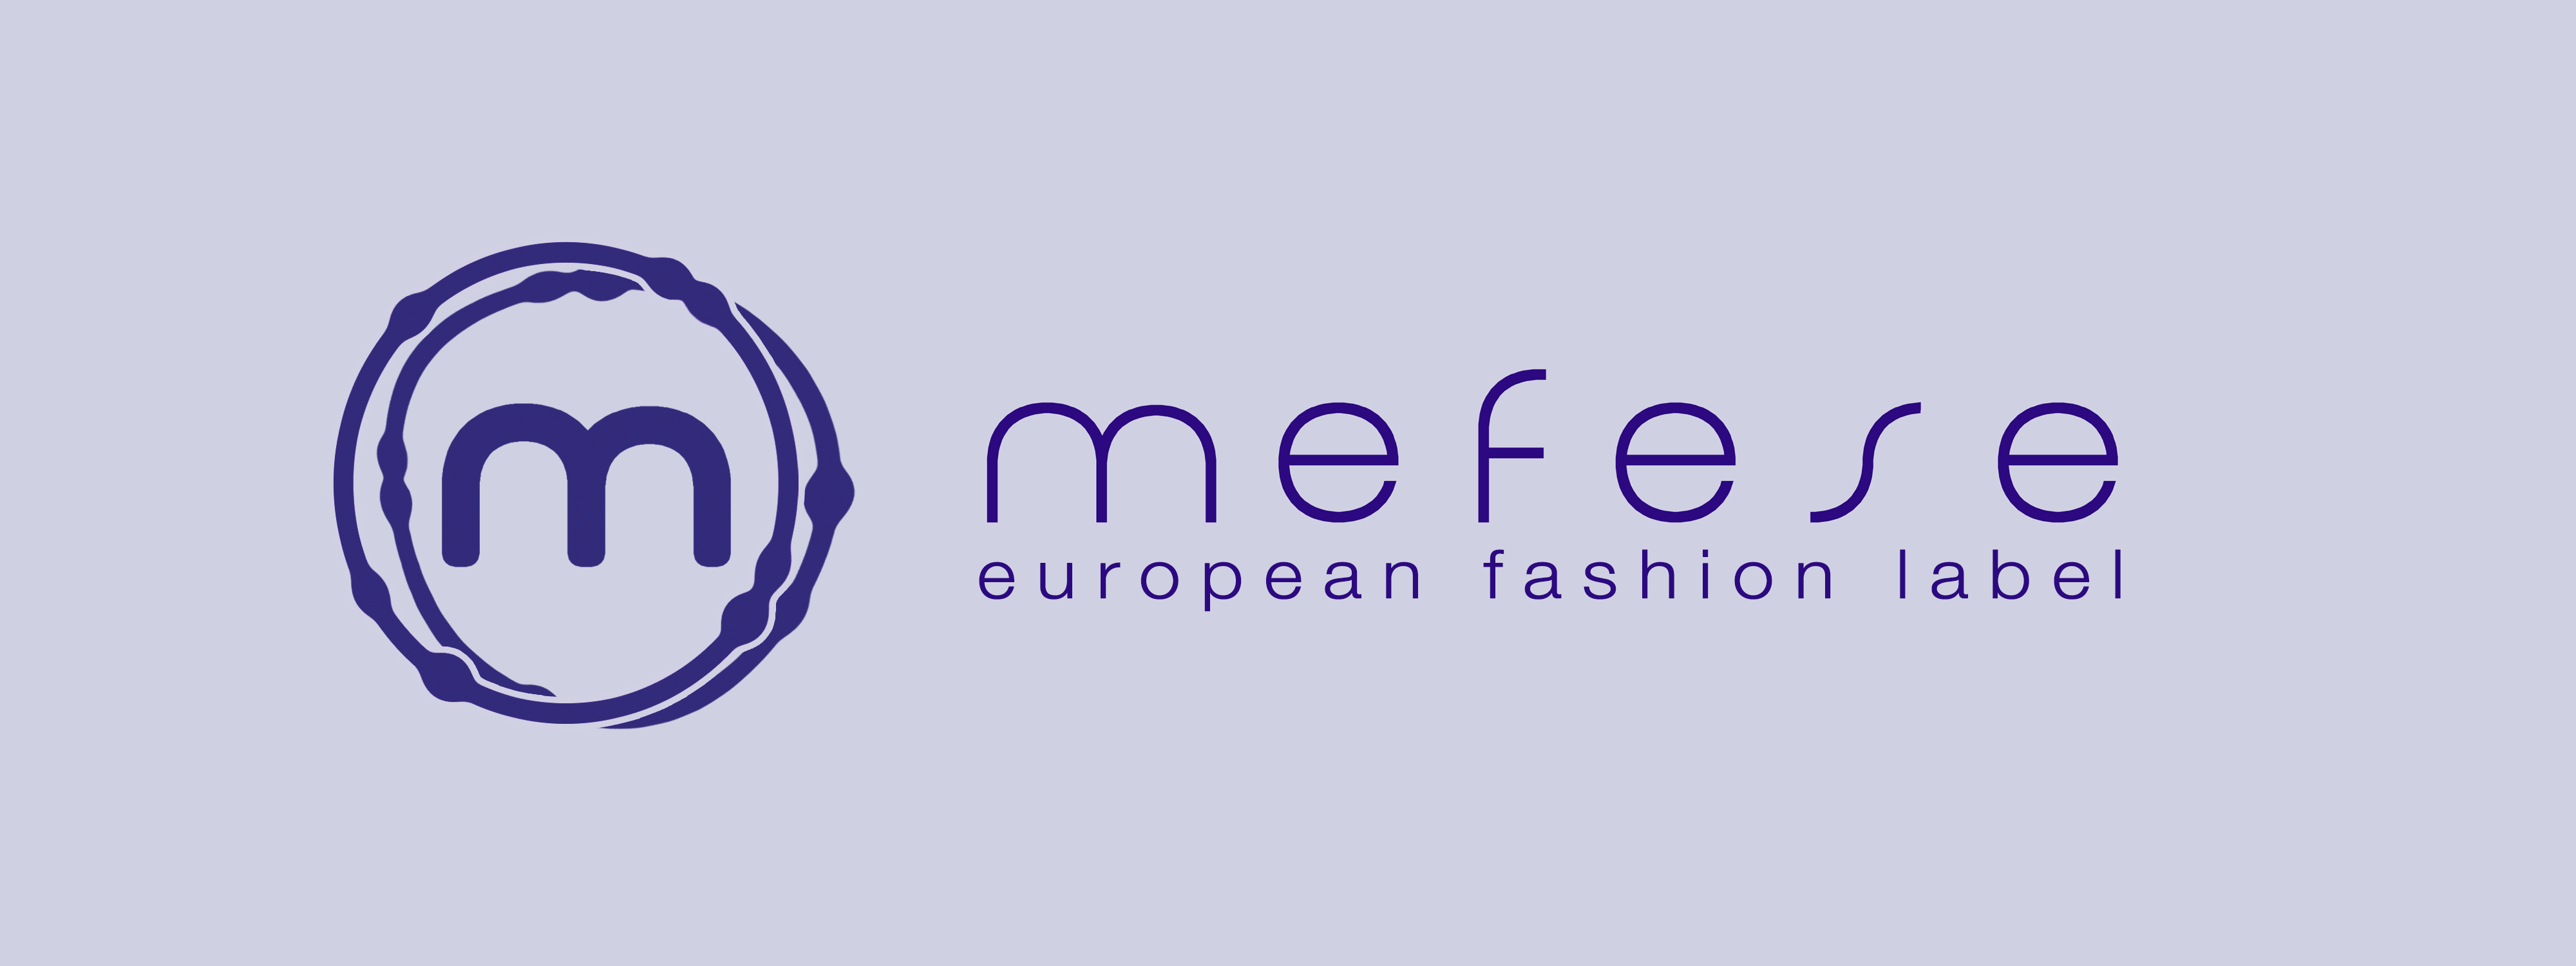 mefese-logo-prostokatpng